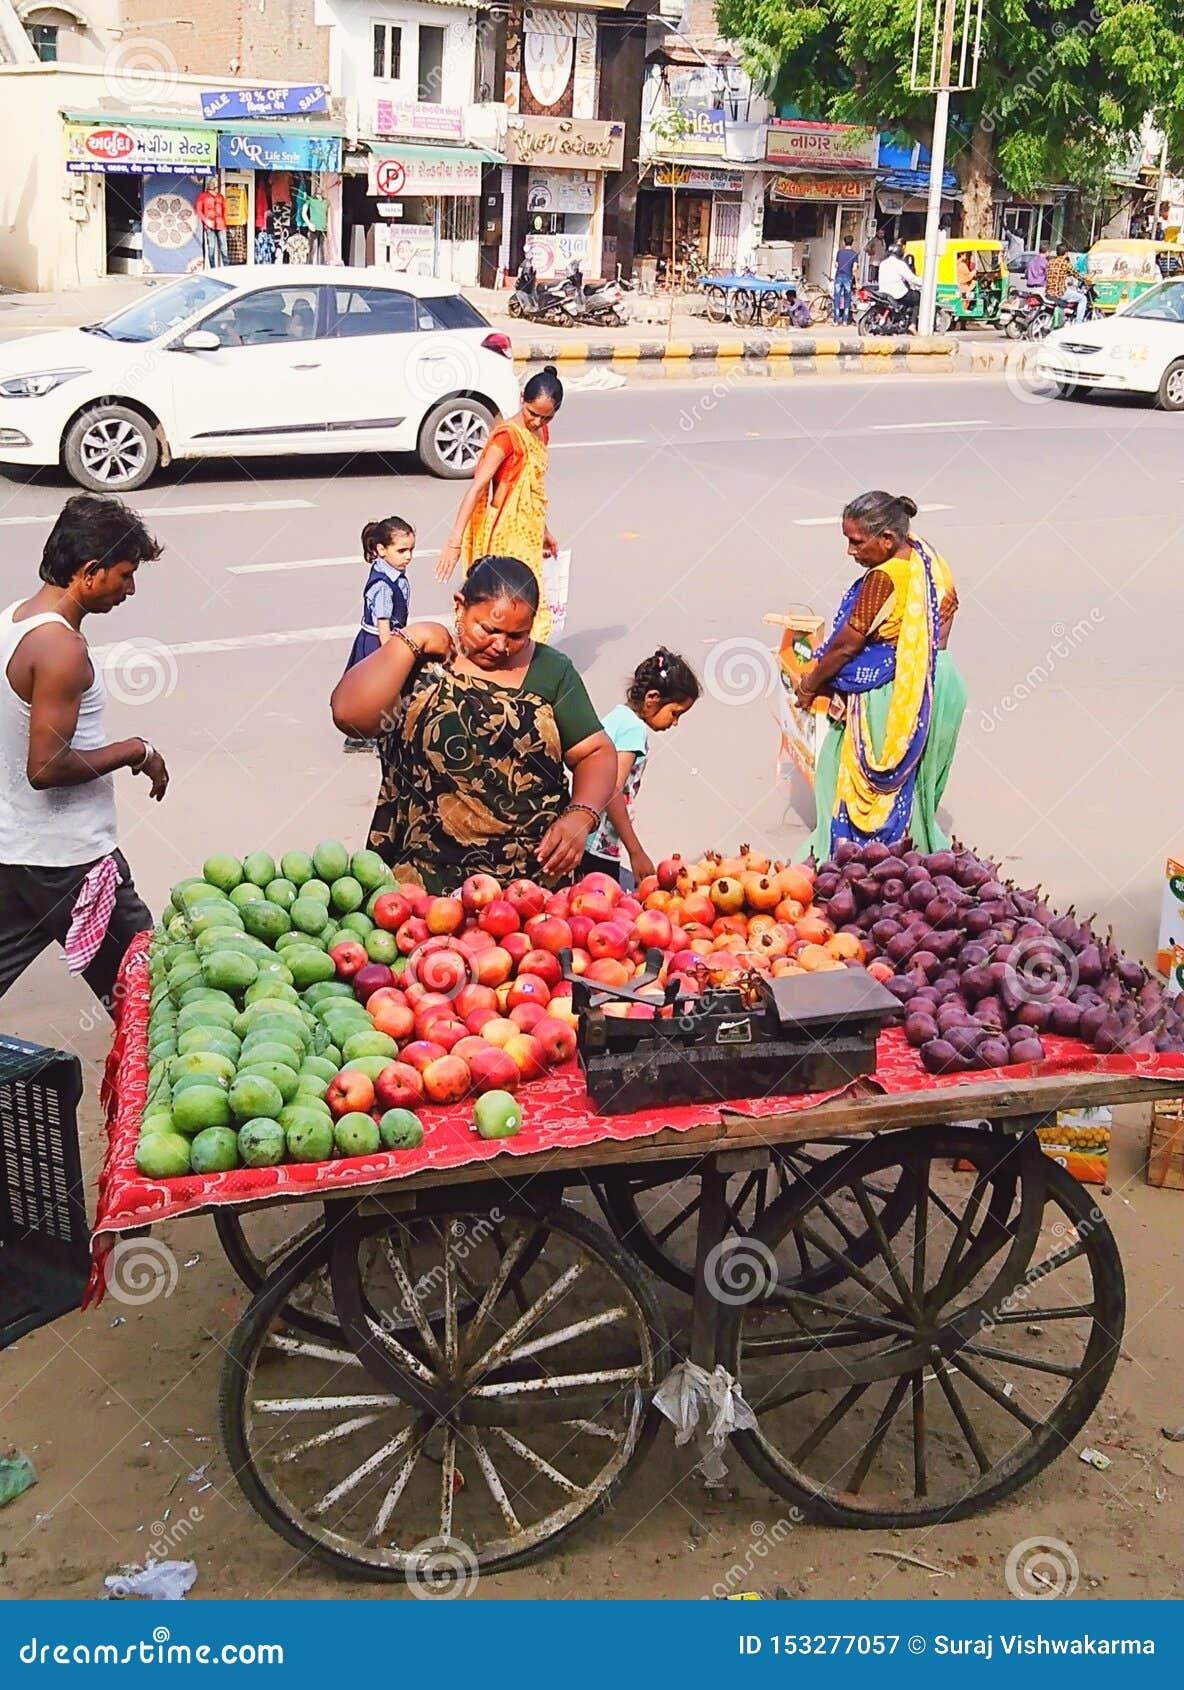 O estilo indiano do negócio isto é independente